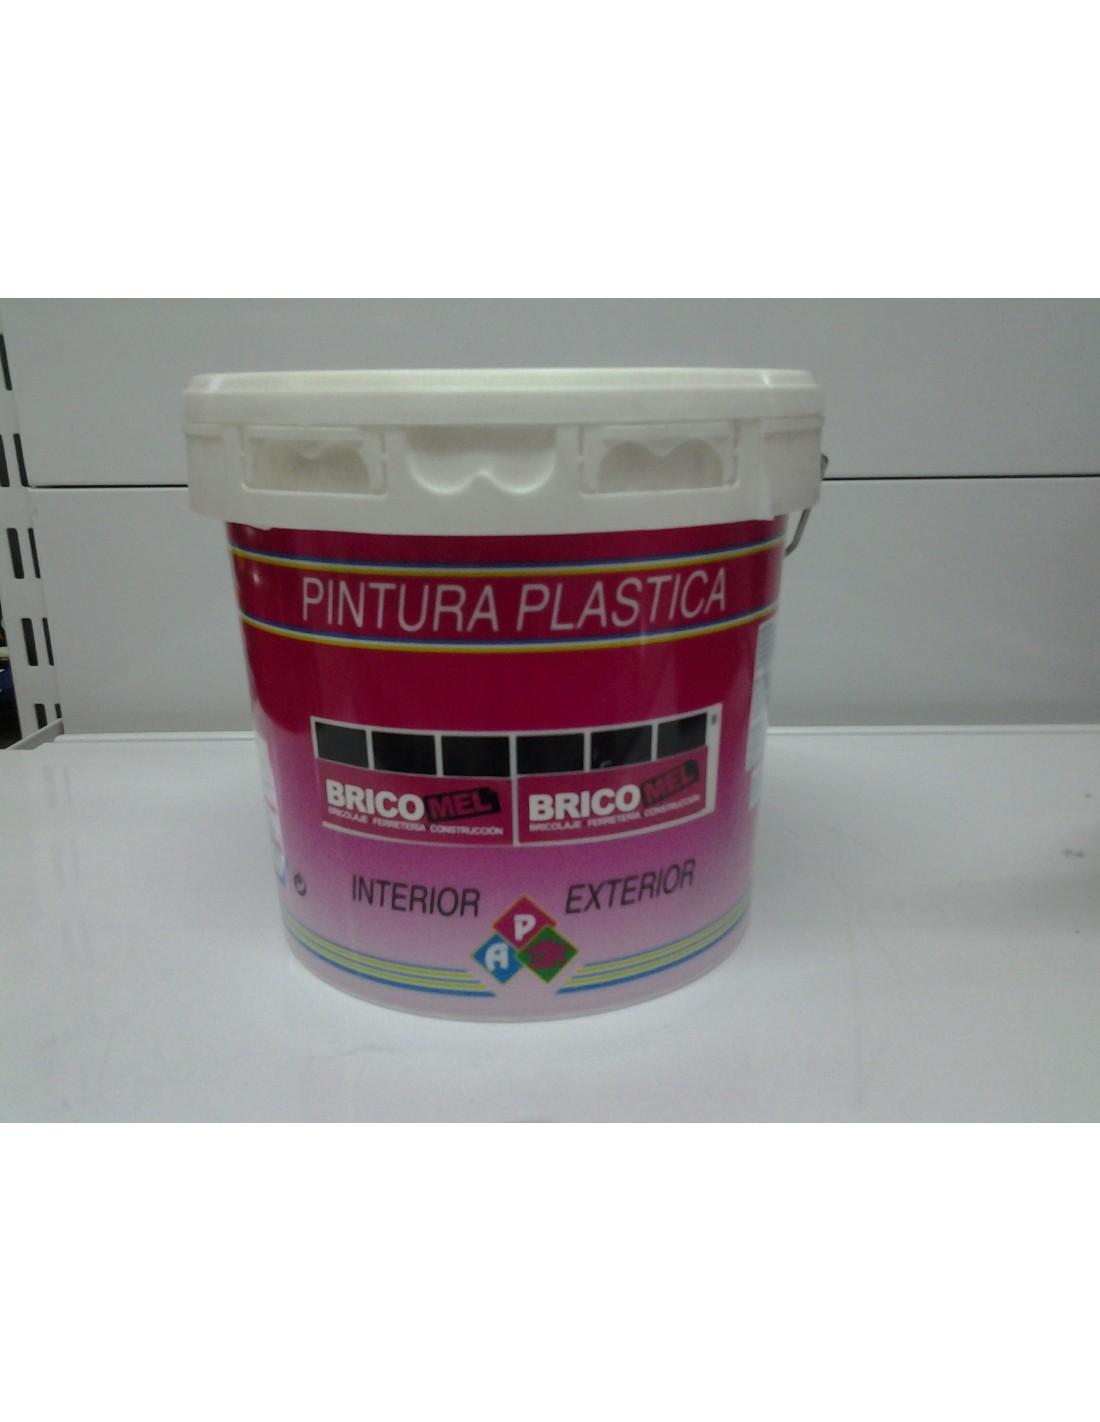 Pintura plastica satinada universal 4 l bricomel - Pintura plastica satinada ...